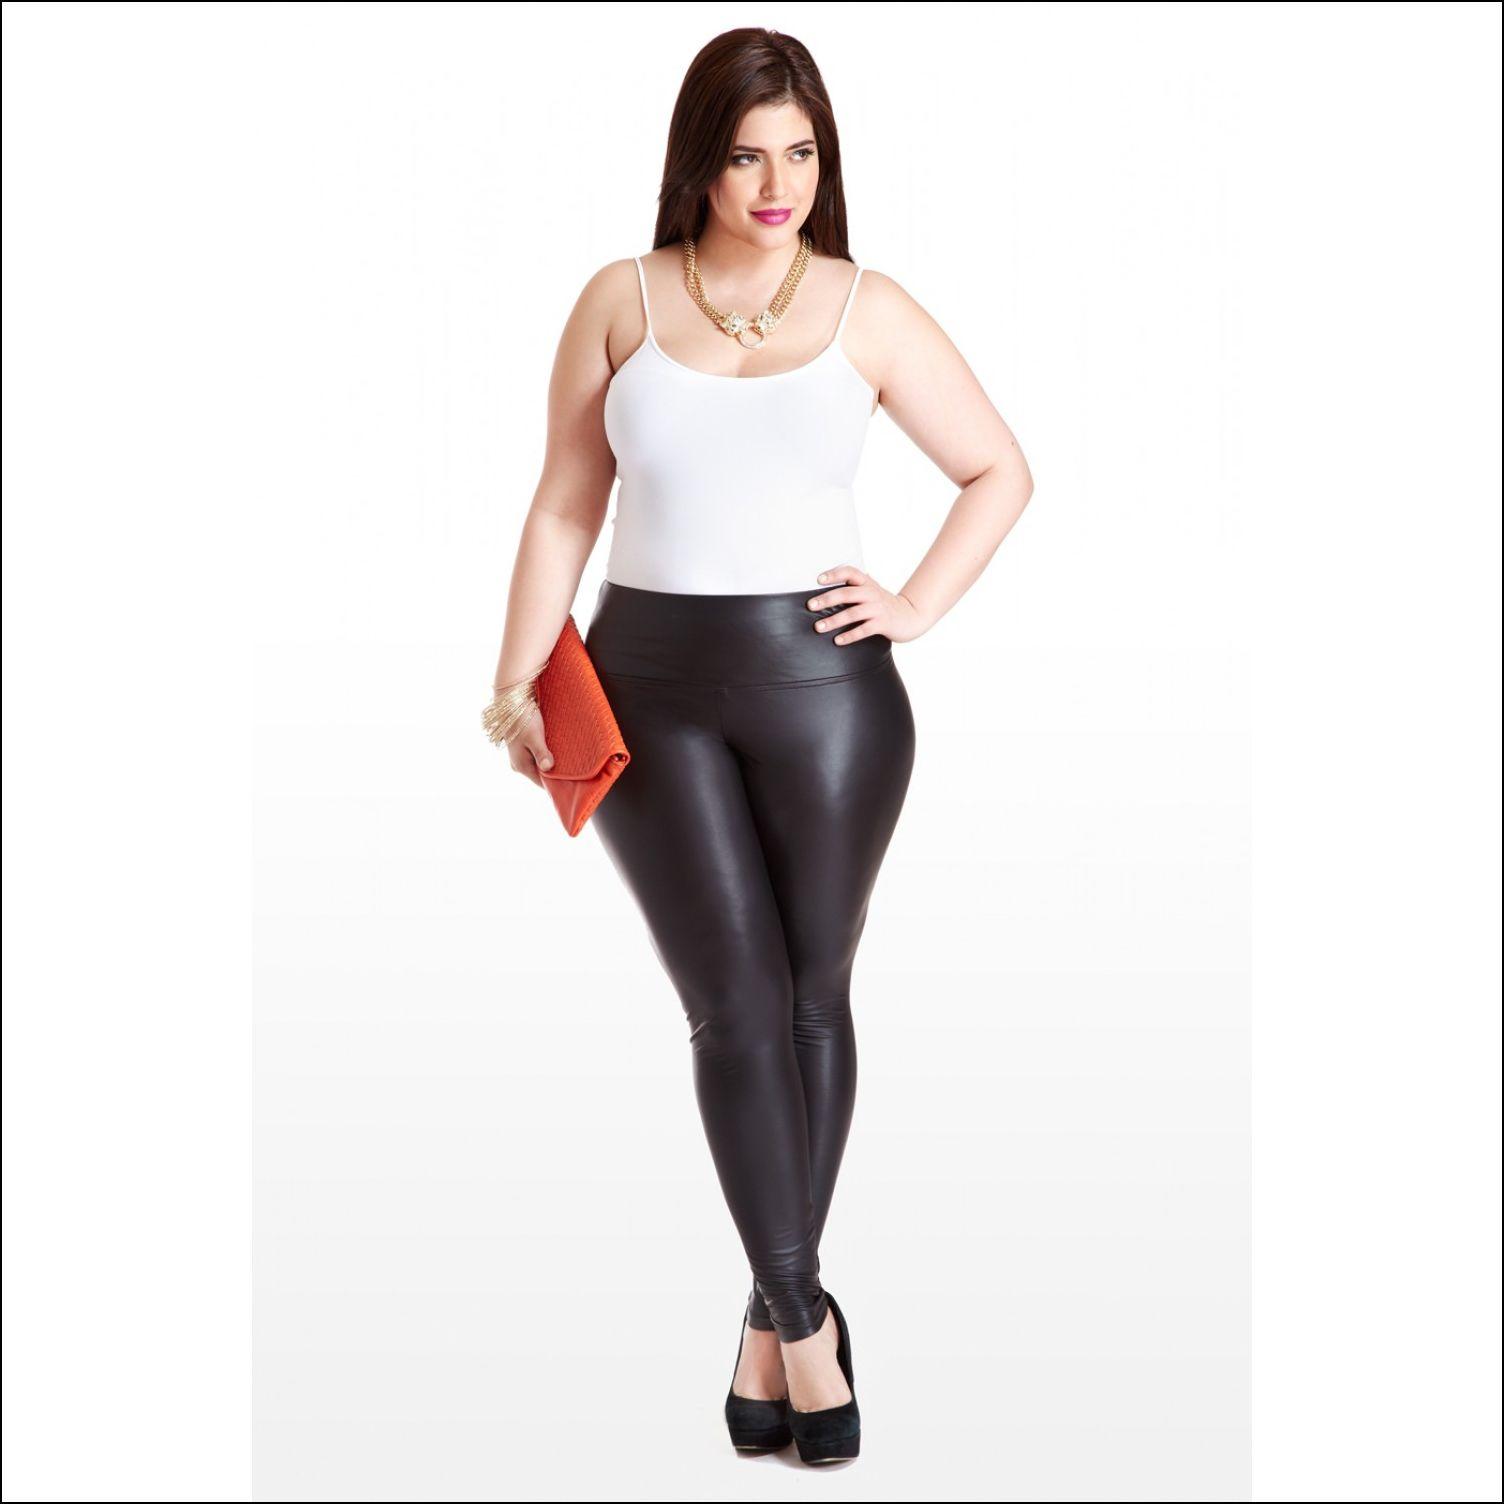 Plus Size Leggings: Suits Beautifully